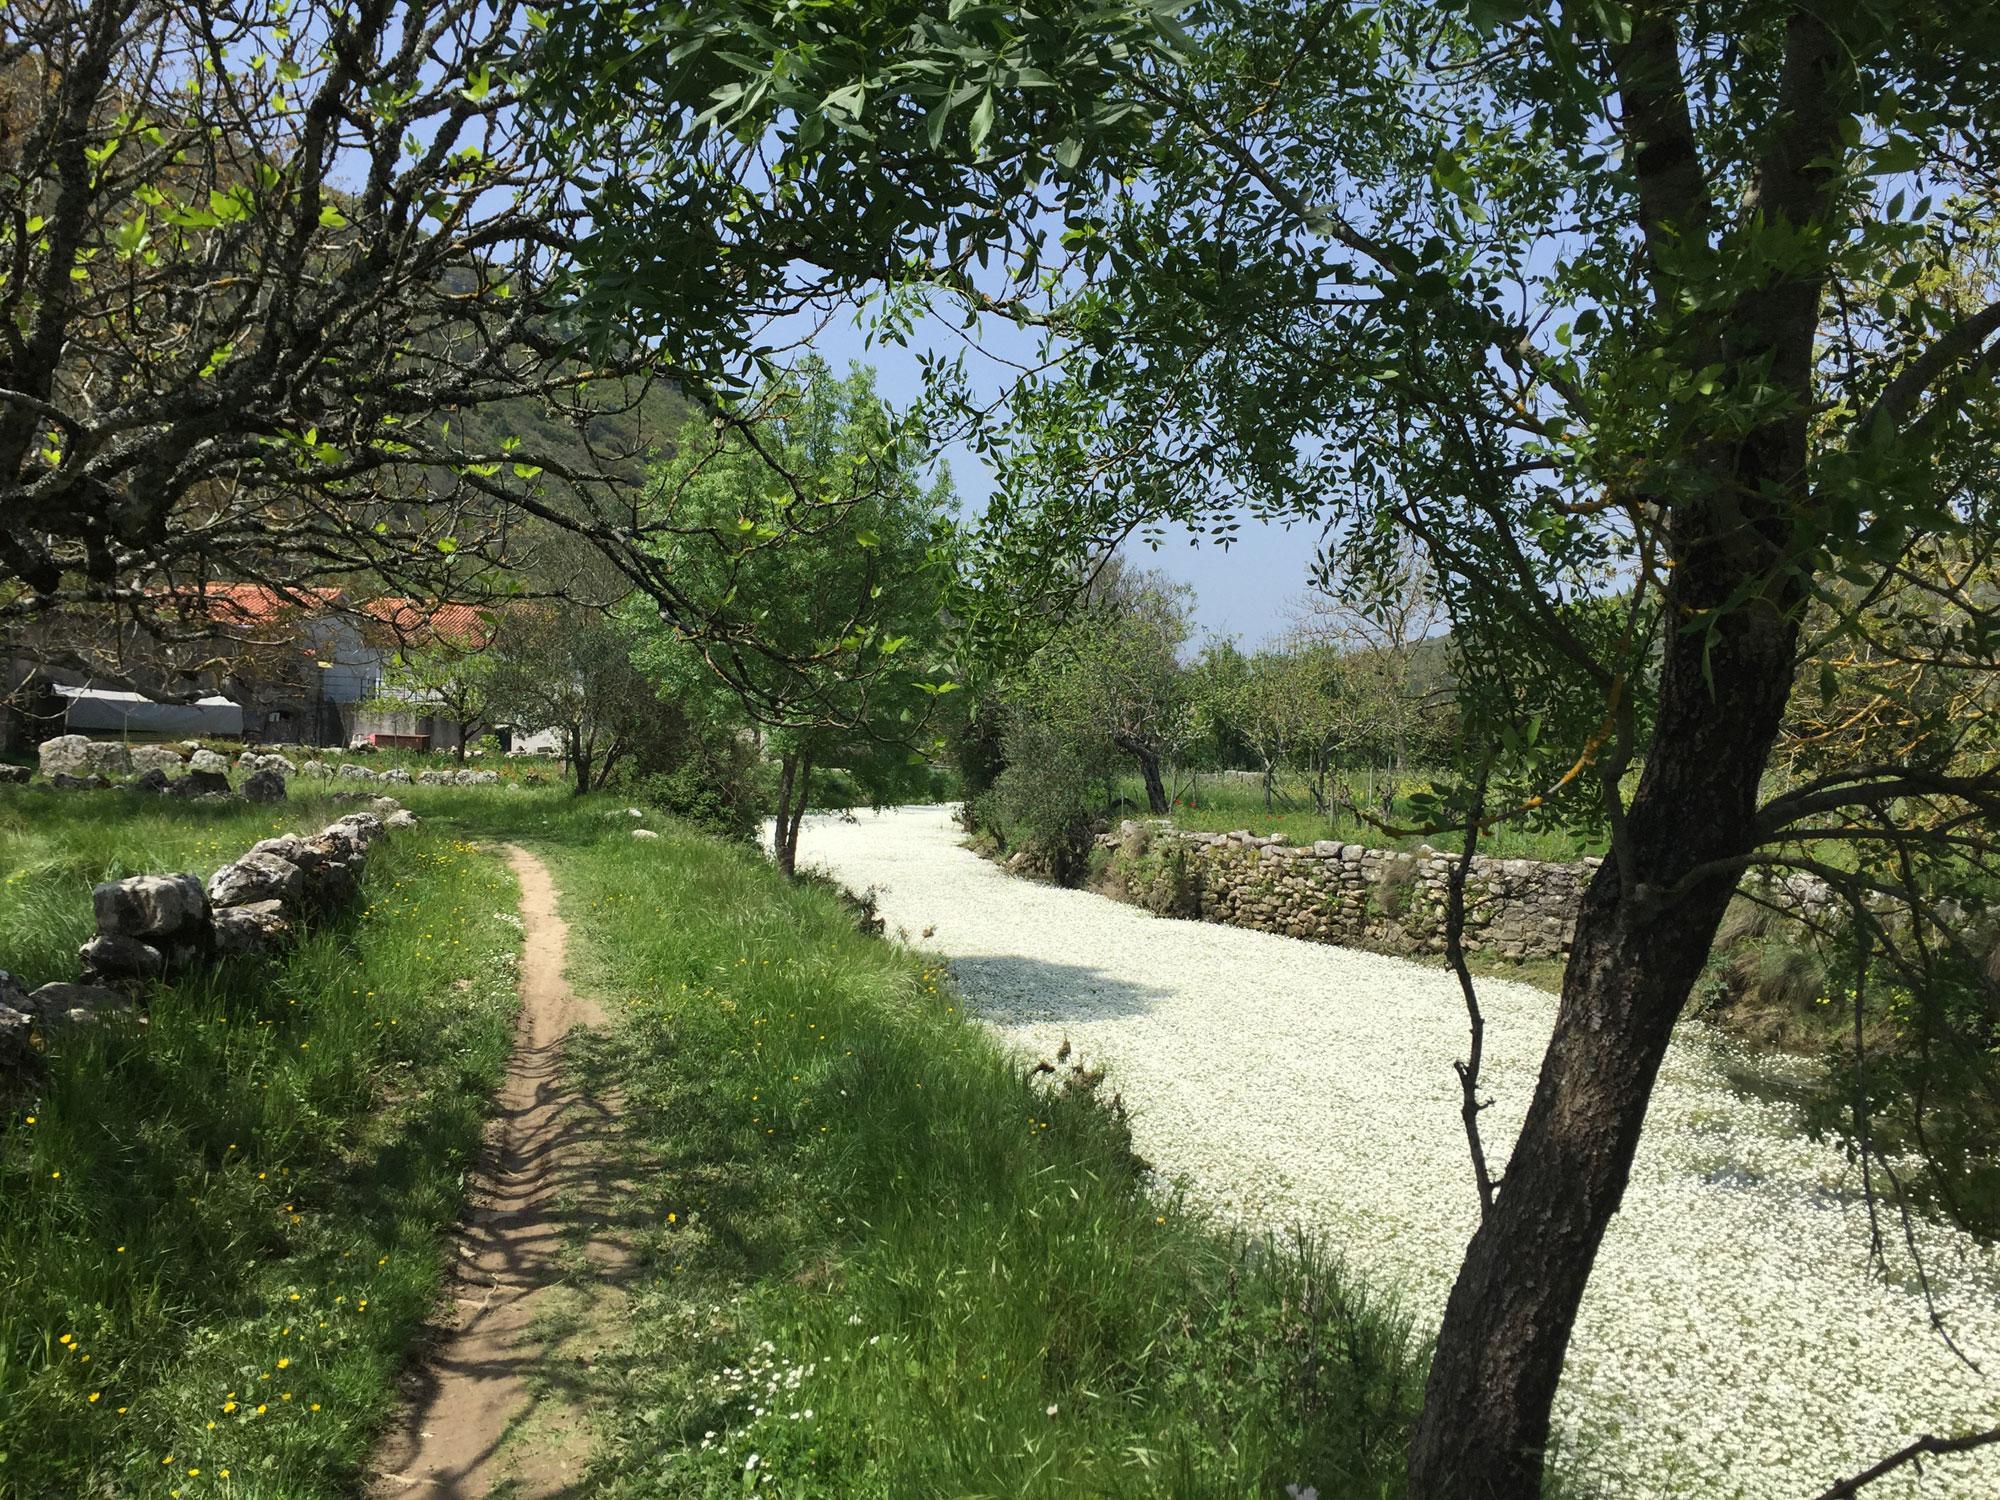 Pilgerweg am mit Blüten gefülltem Fluss